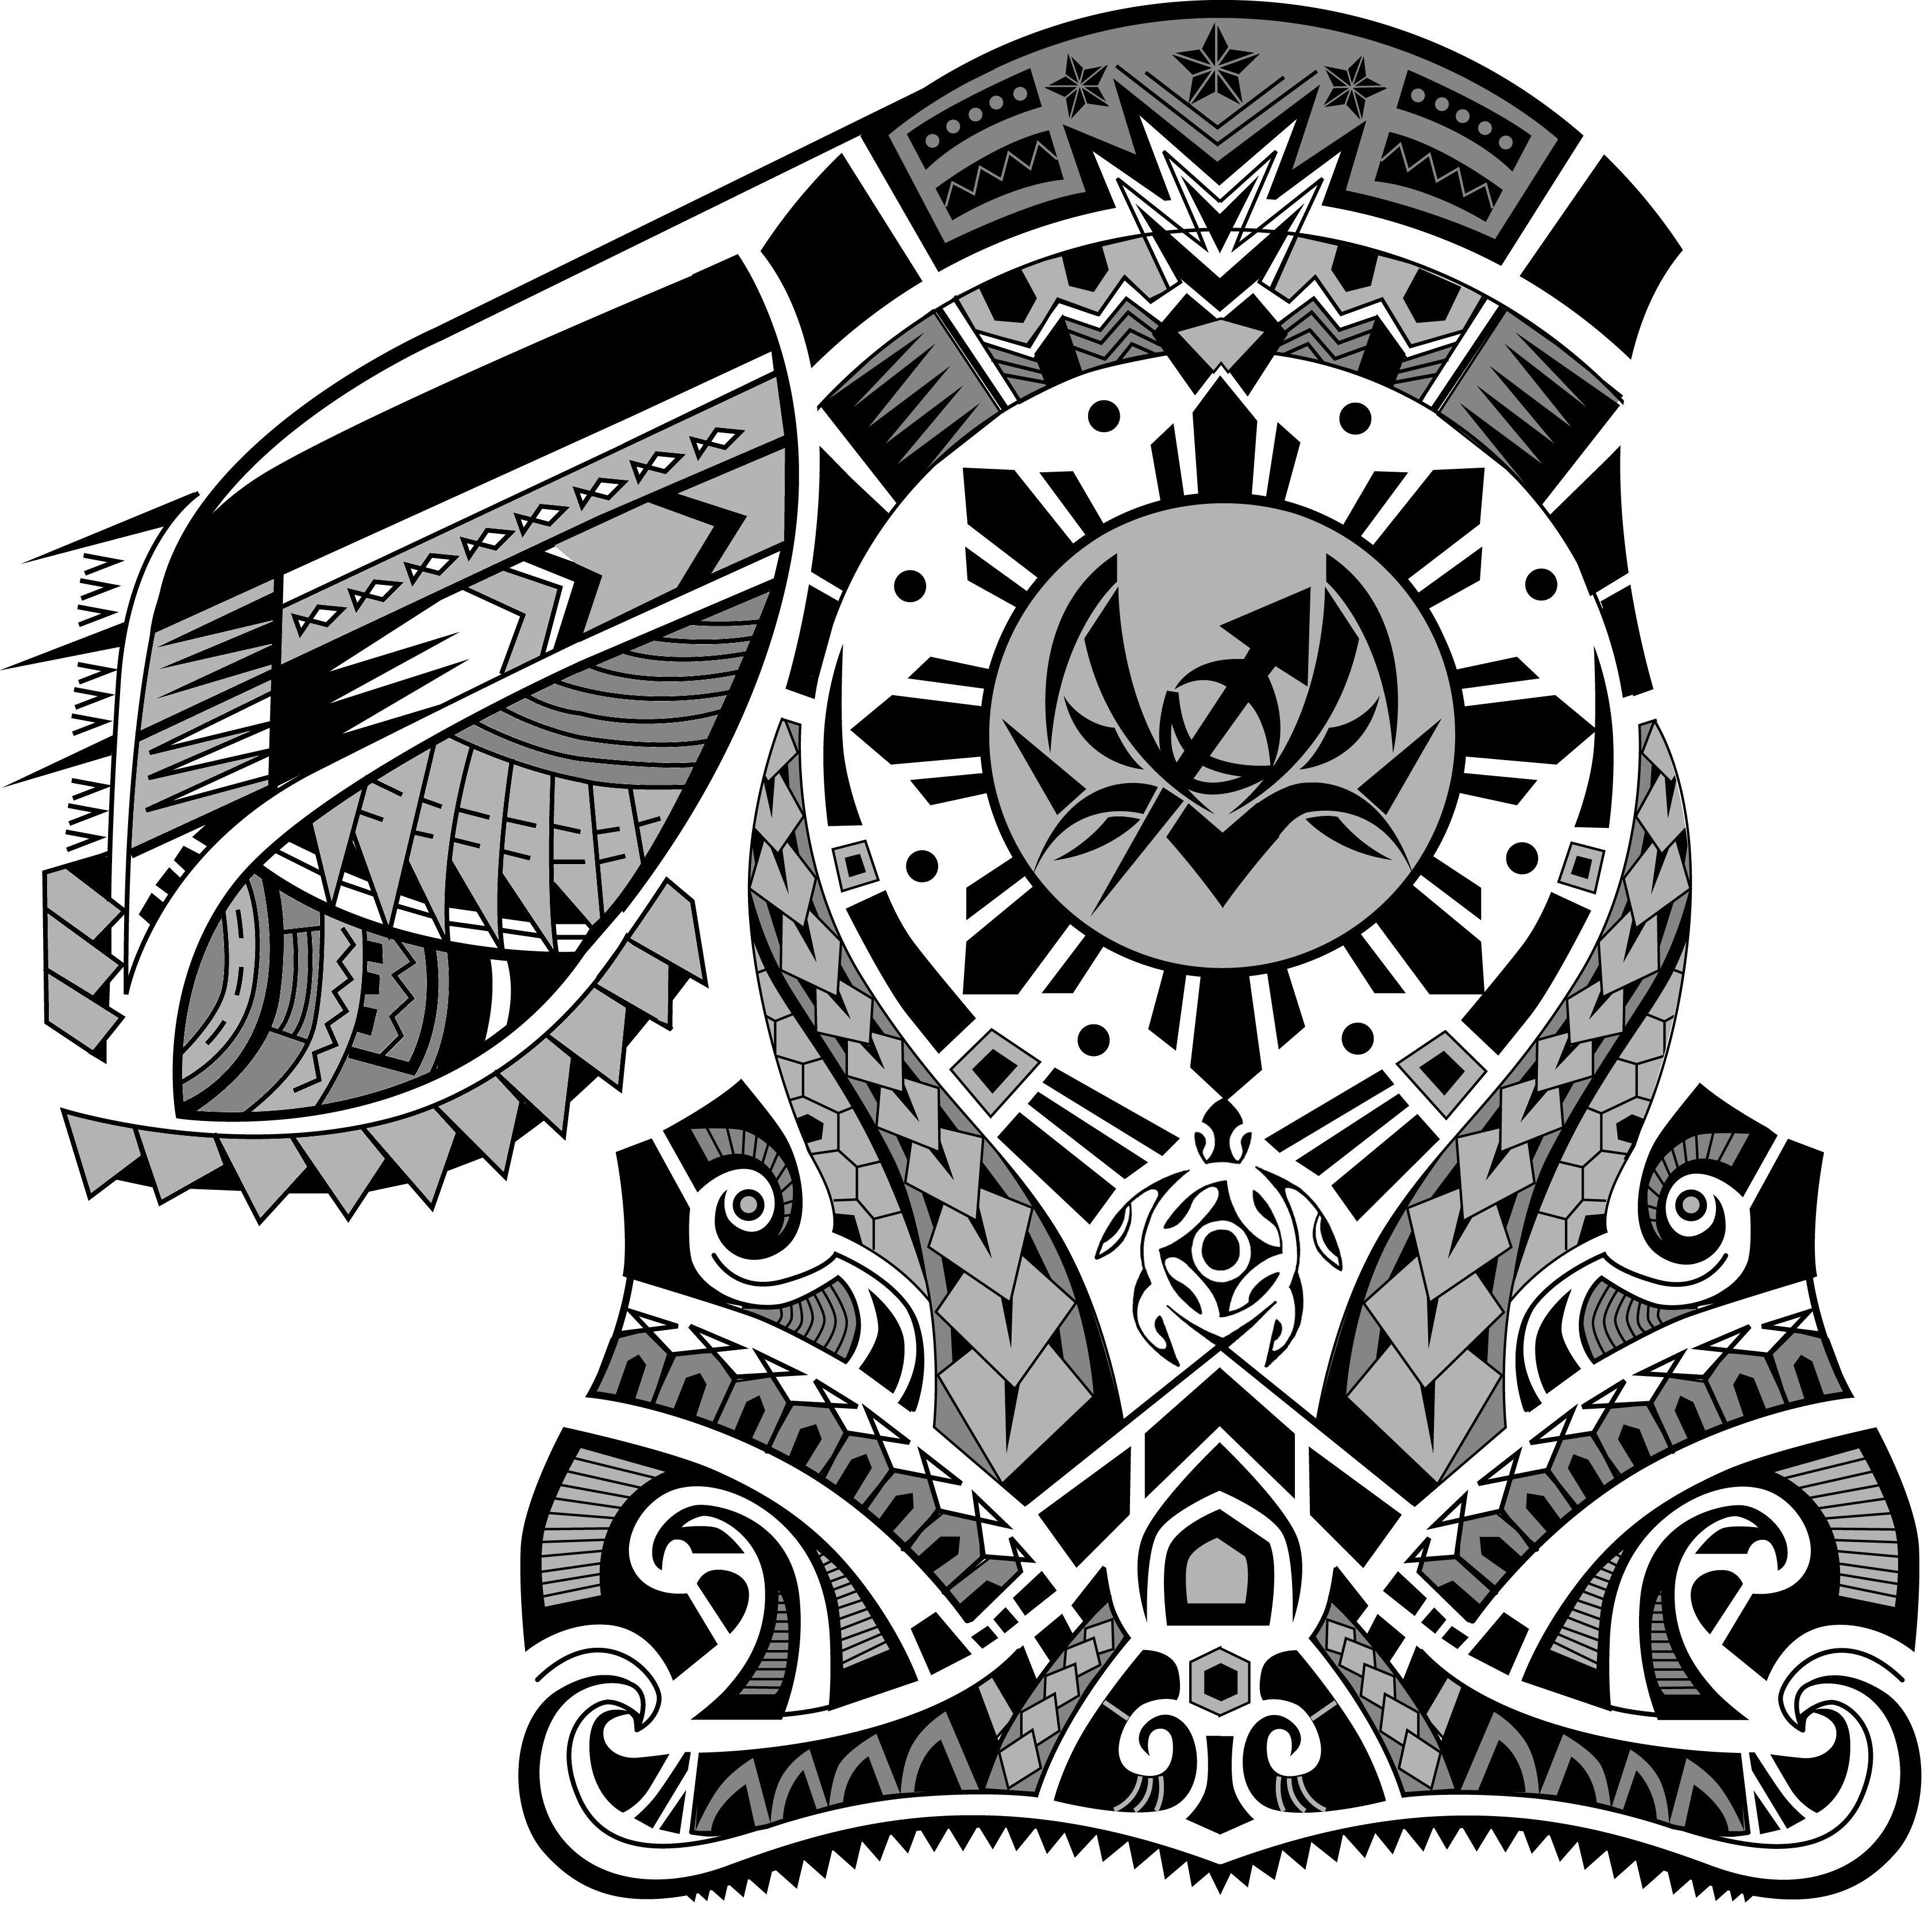 27 Hawaiian Tattoo Ideas Designs: Polynesian Chest Half Sleeve Tattoo Design. Designer